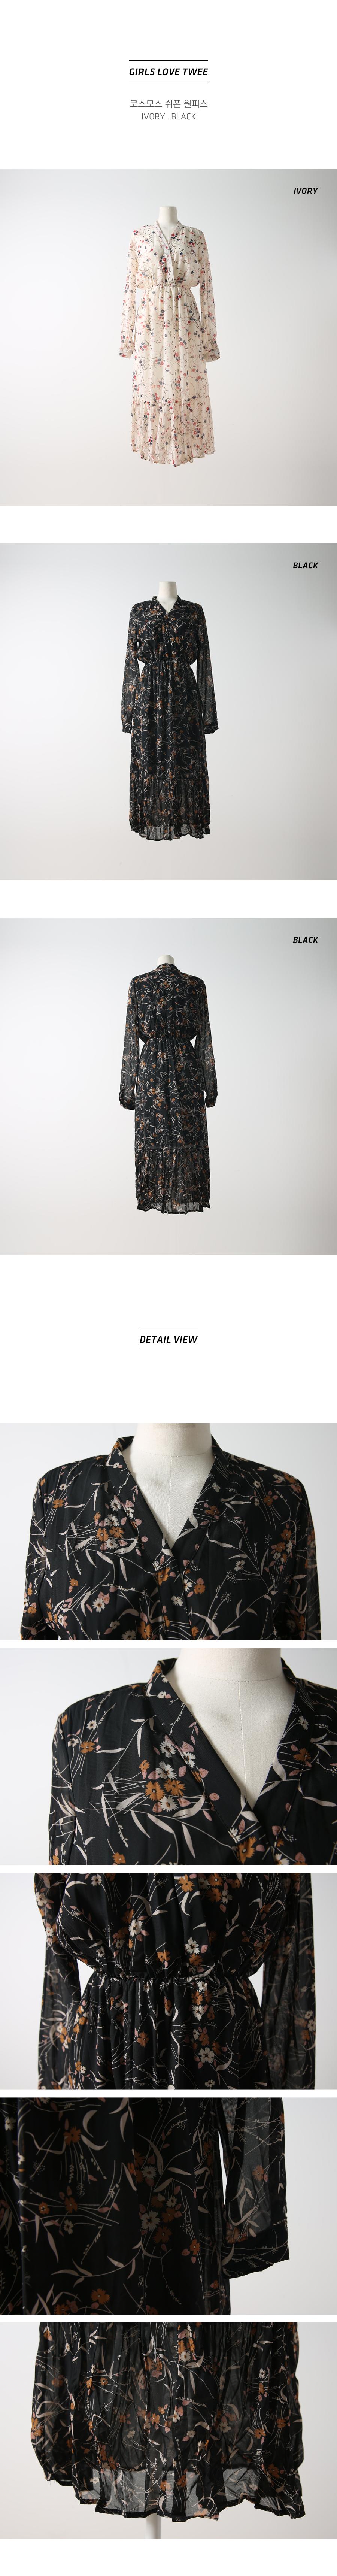 Cosmos Chiffon Dress